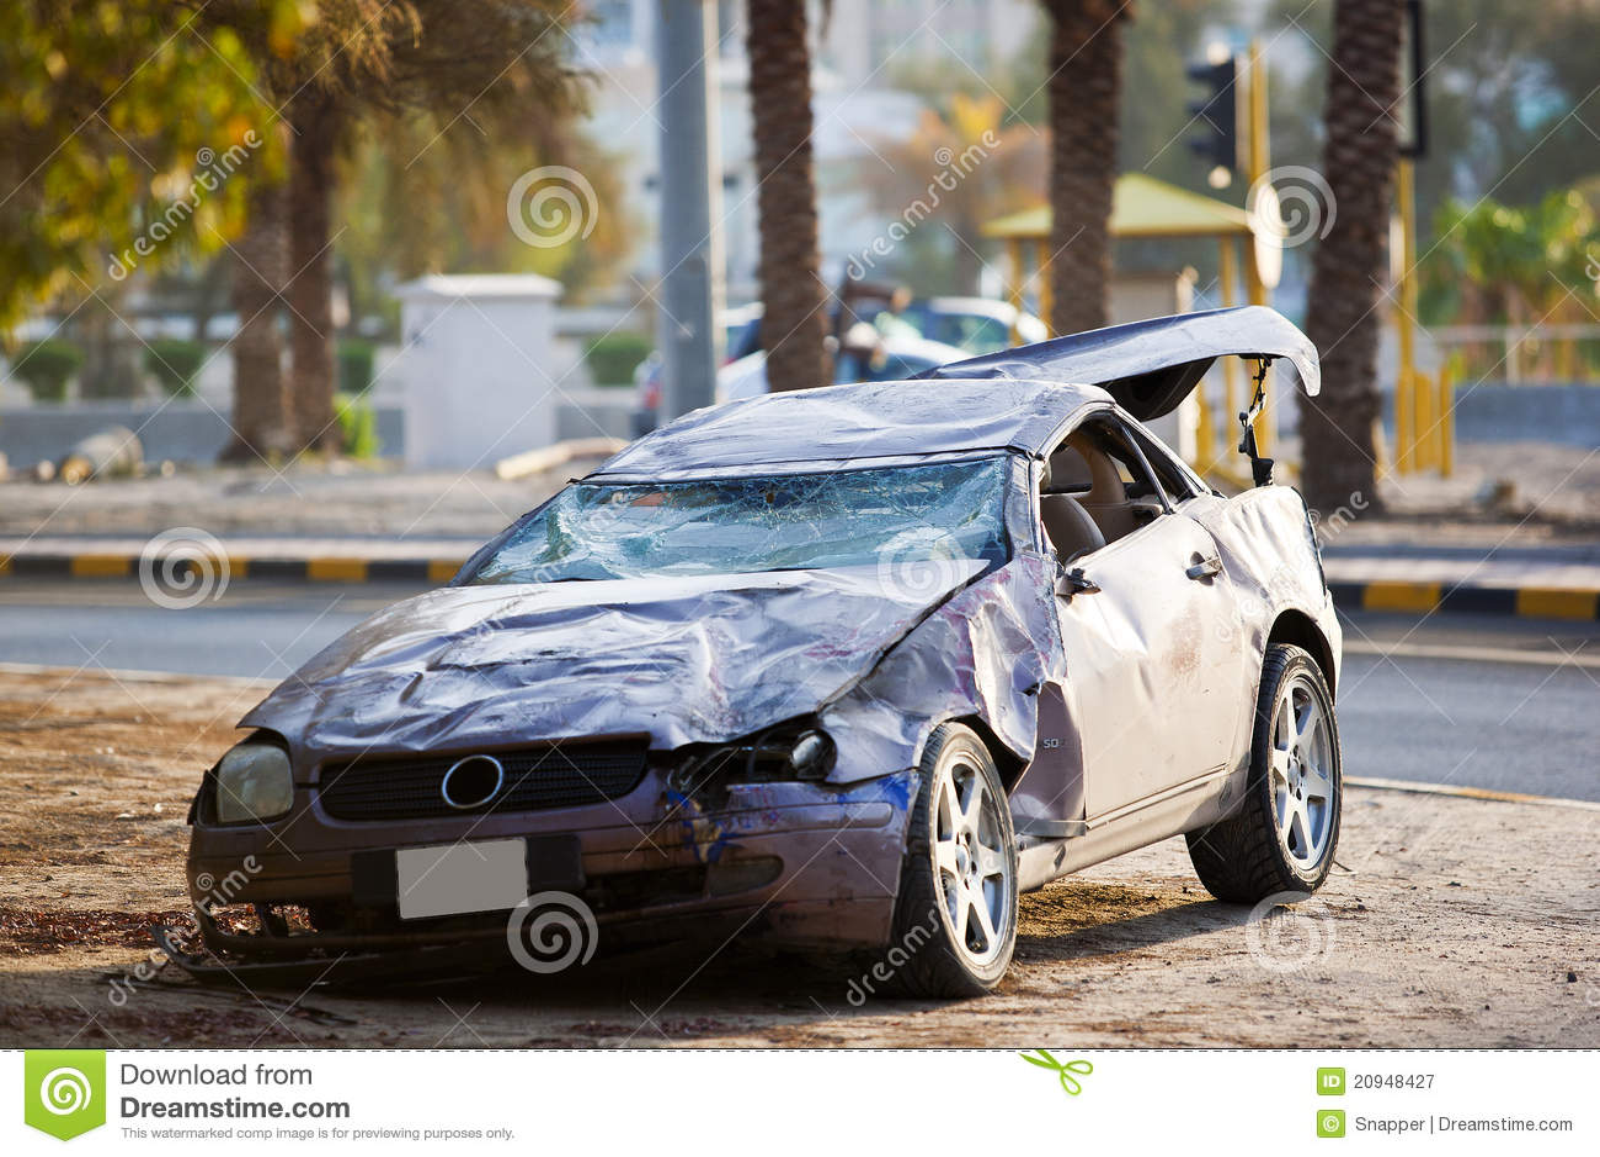 Luxury Car Crash